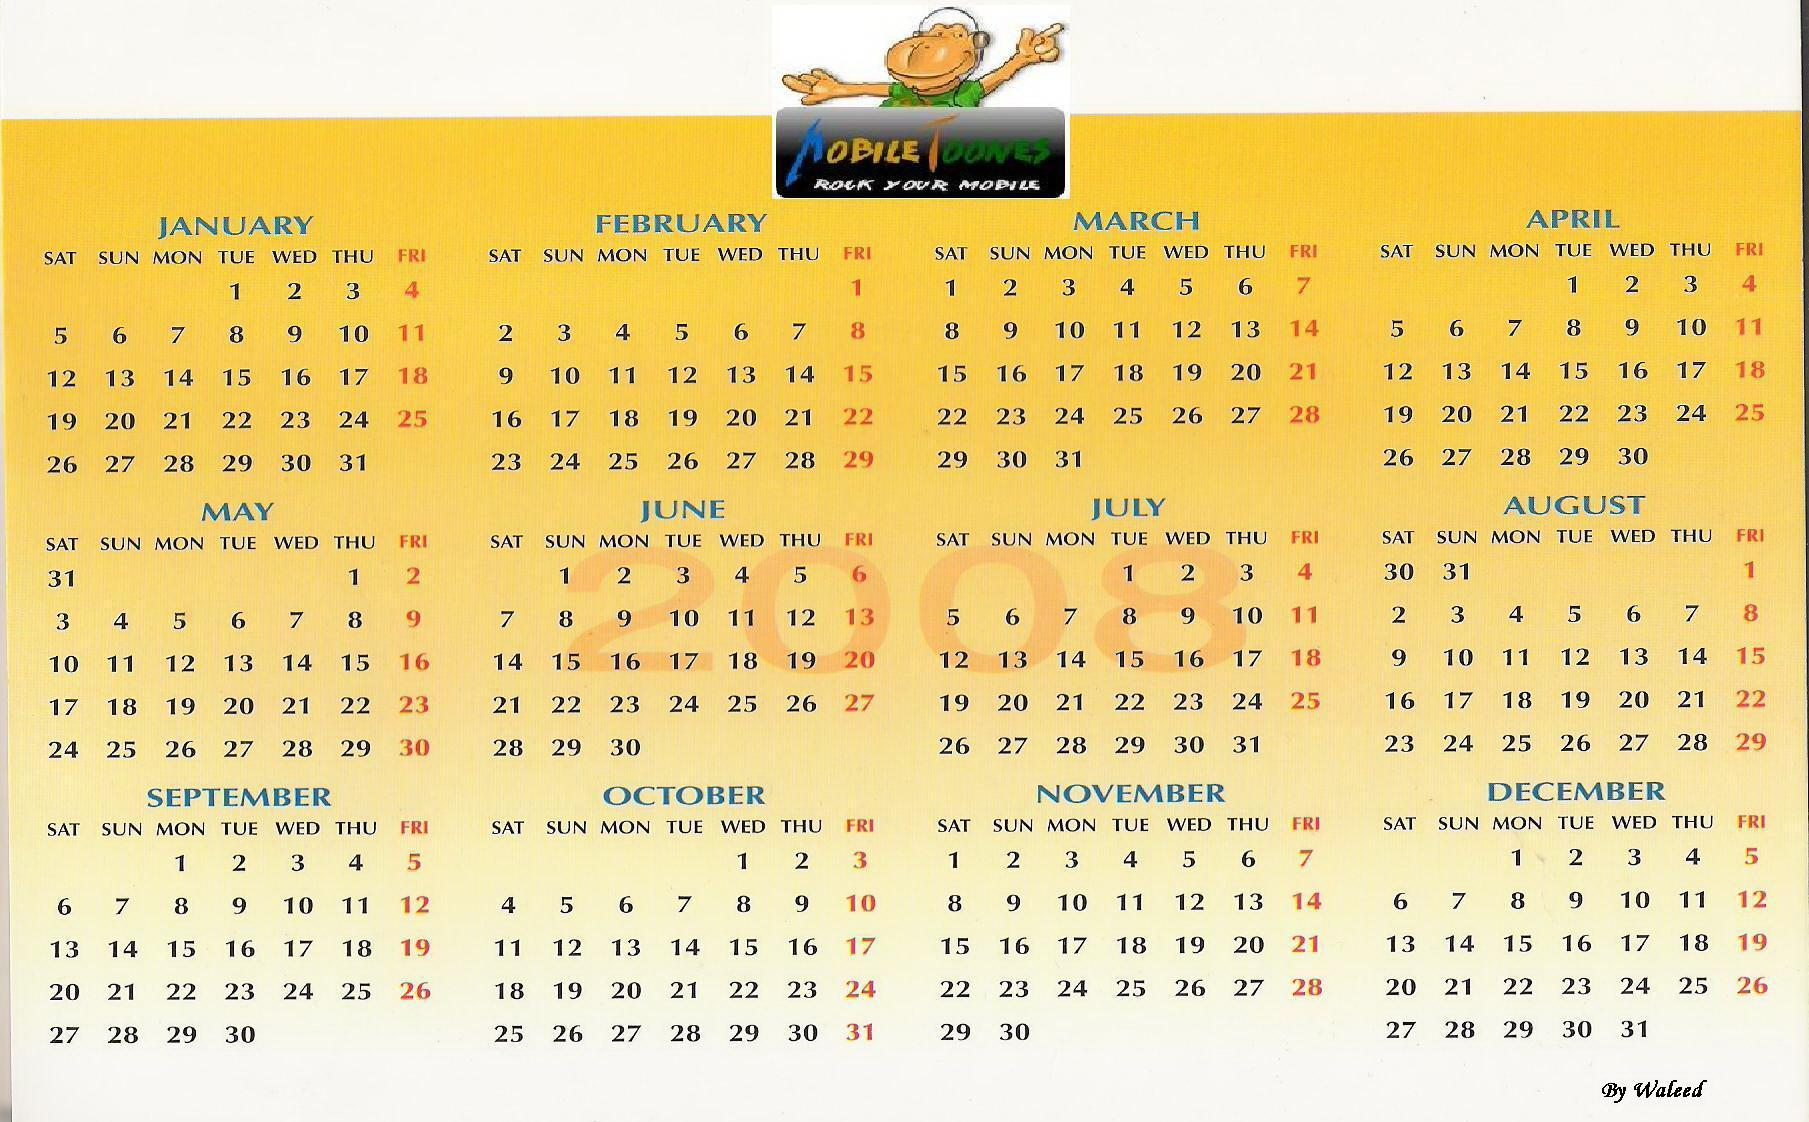 Calendar 2008 From Mobile Toones Mobile Wallpaper